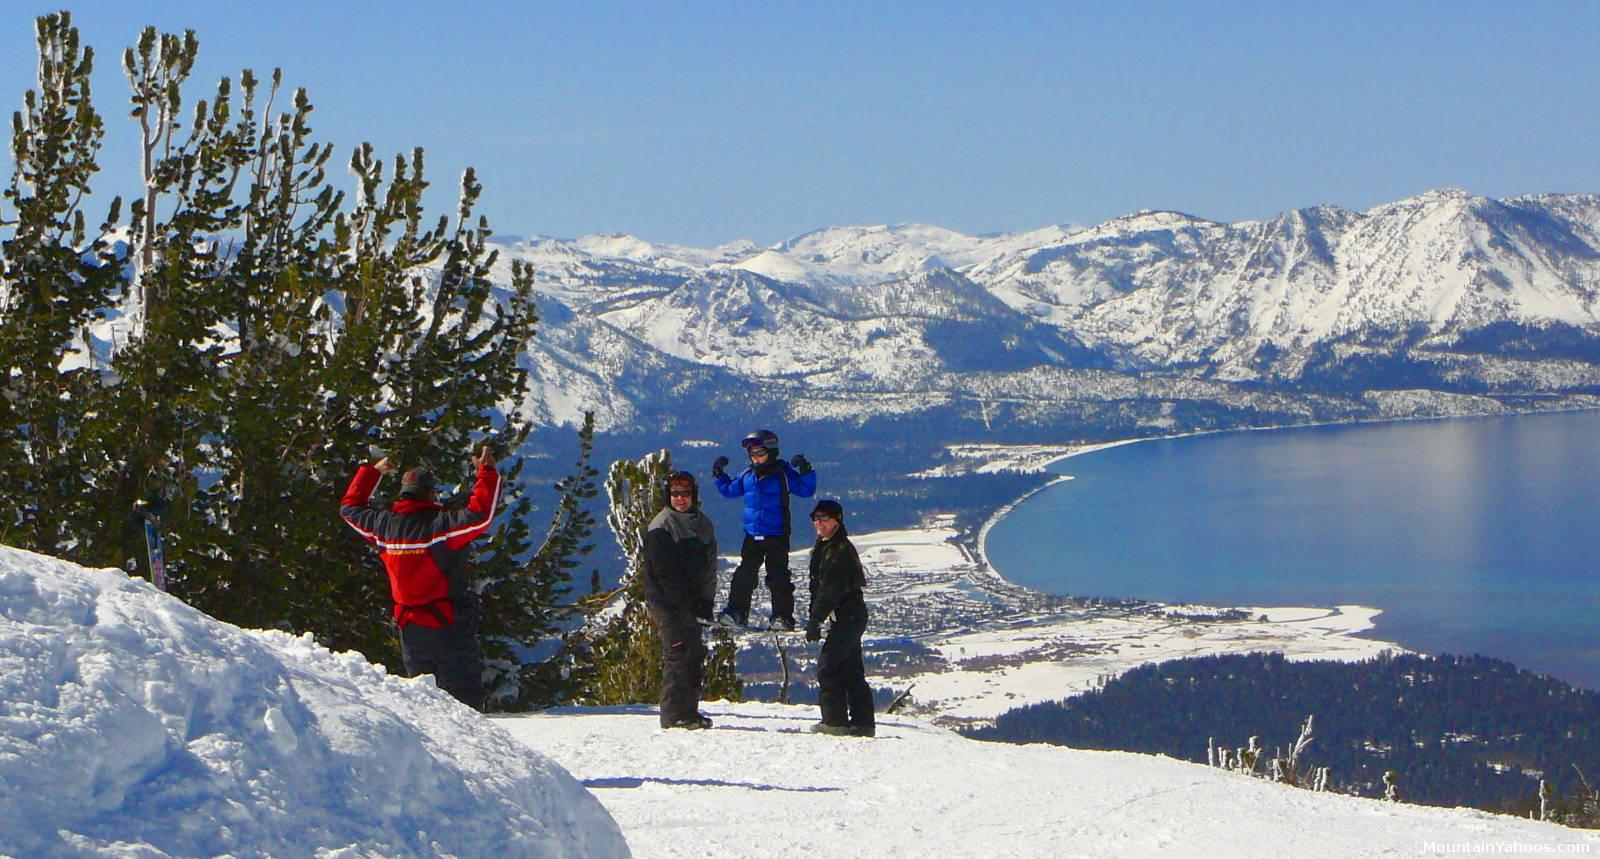 Best Kitchen Gallery: Heavenly Ski Area In Tahoe California Us Ski Resort Review And Guide of Hotels Near Heavenly Ski Resort  on rachelxblog.com